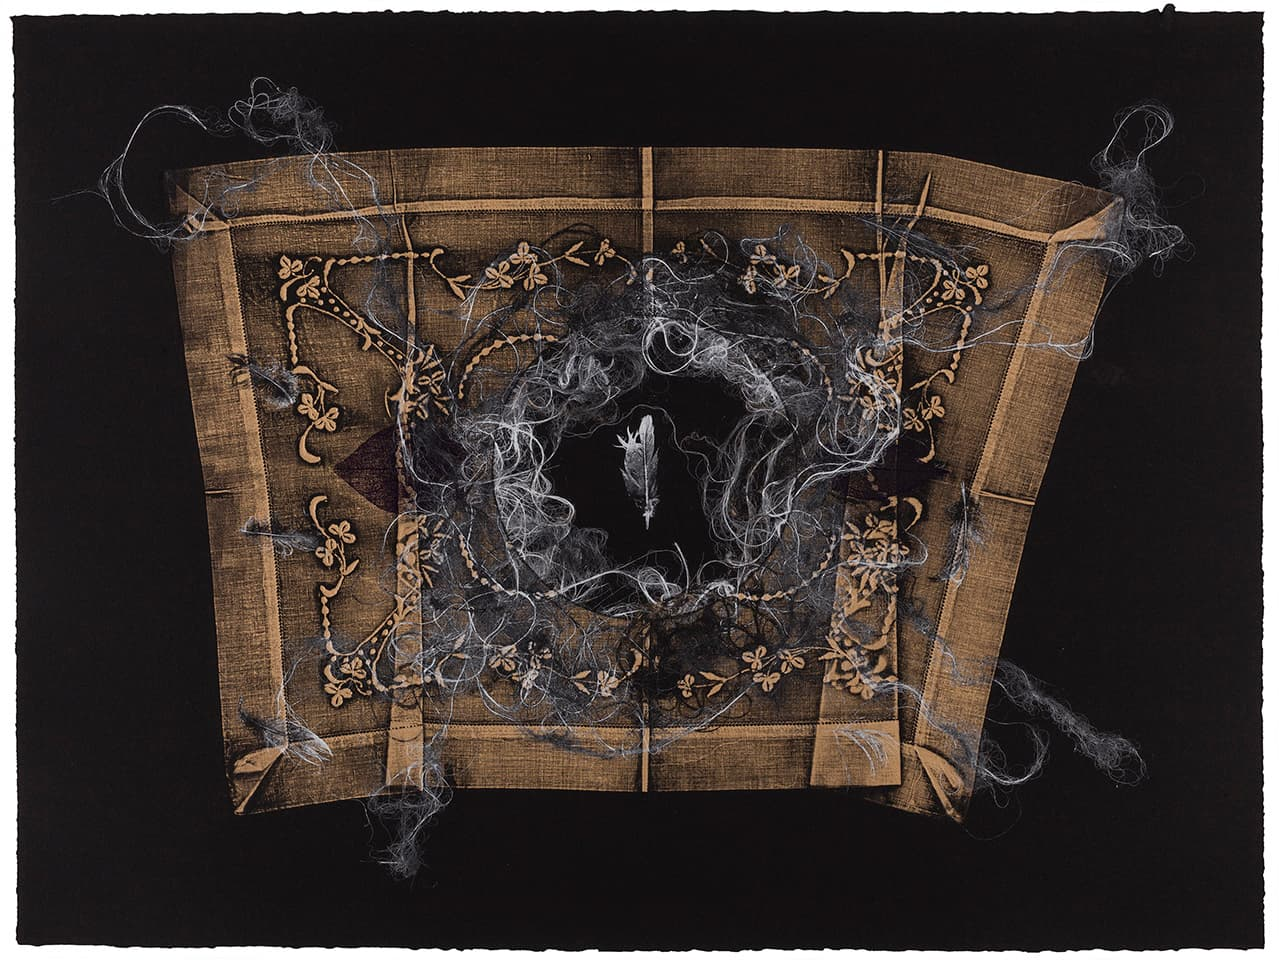 <strong>Golden Slumbers 6</strong>, Susan Aldworth, monoprint, 56 x 76 cms, 2017. Photograph by Peter Abrahams.